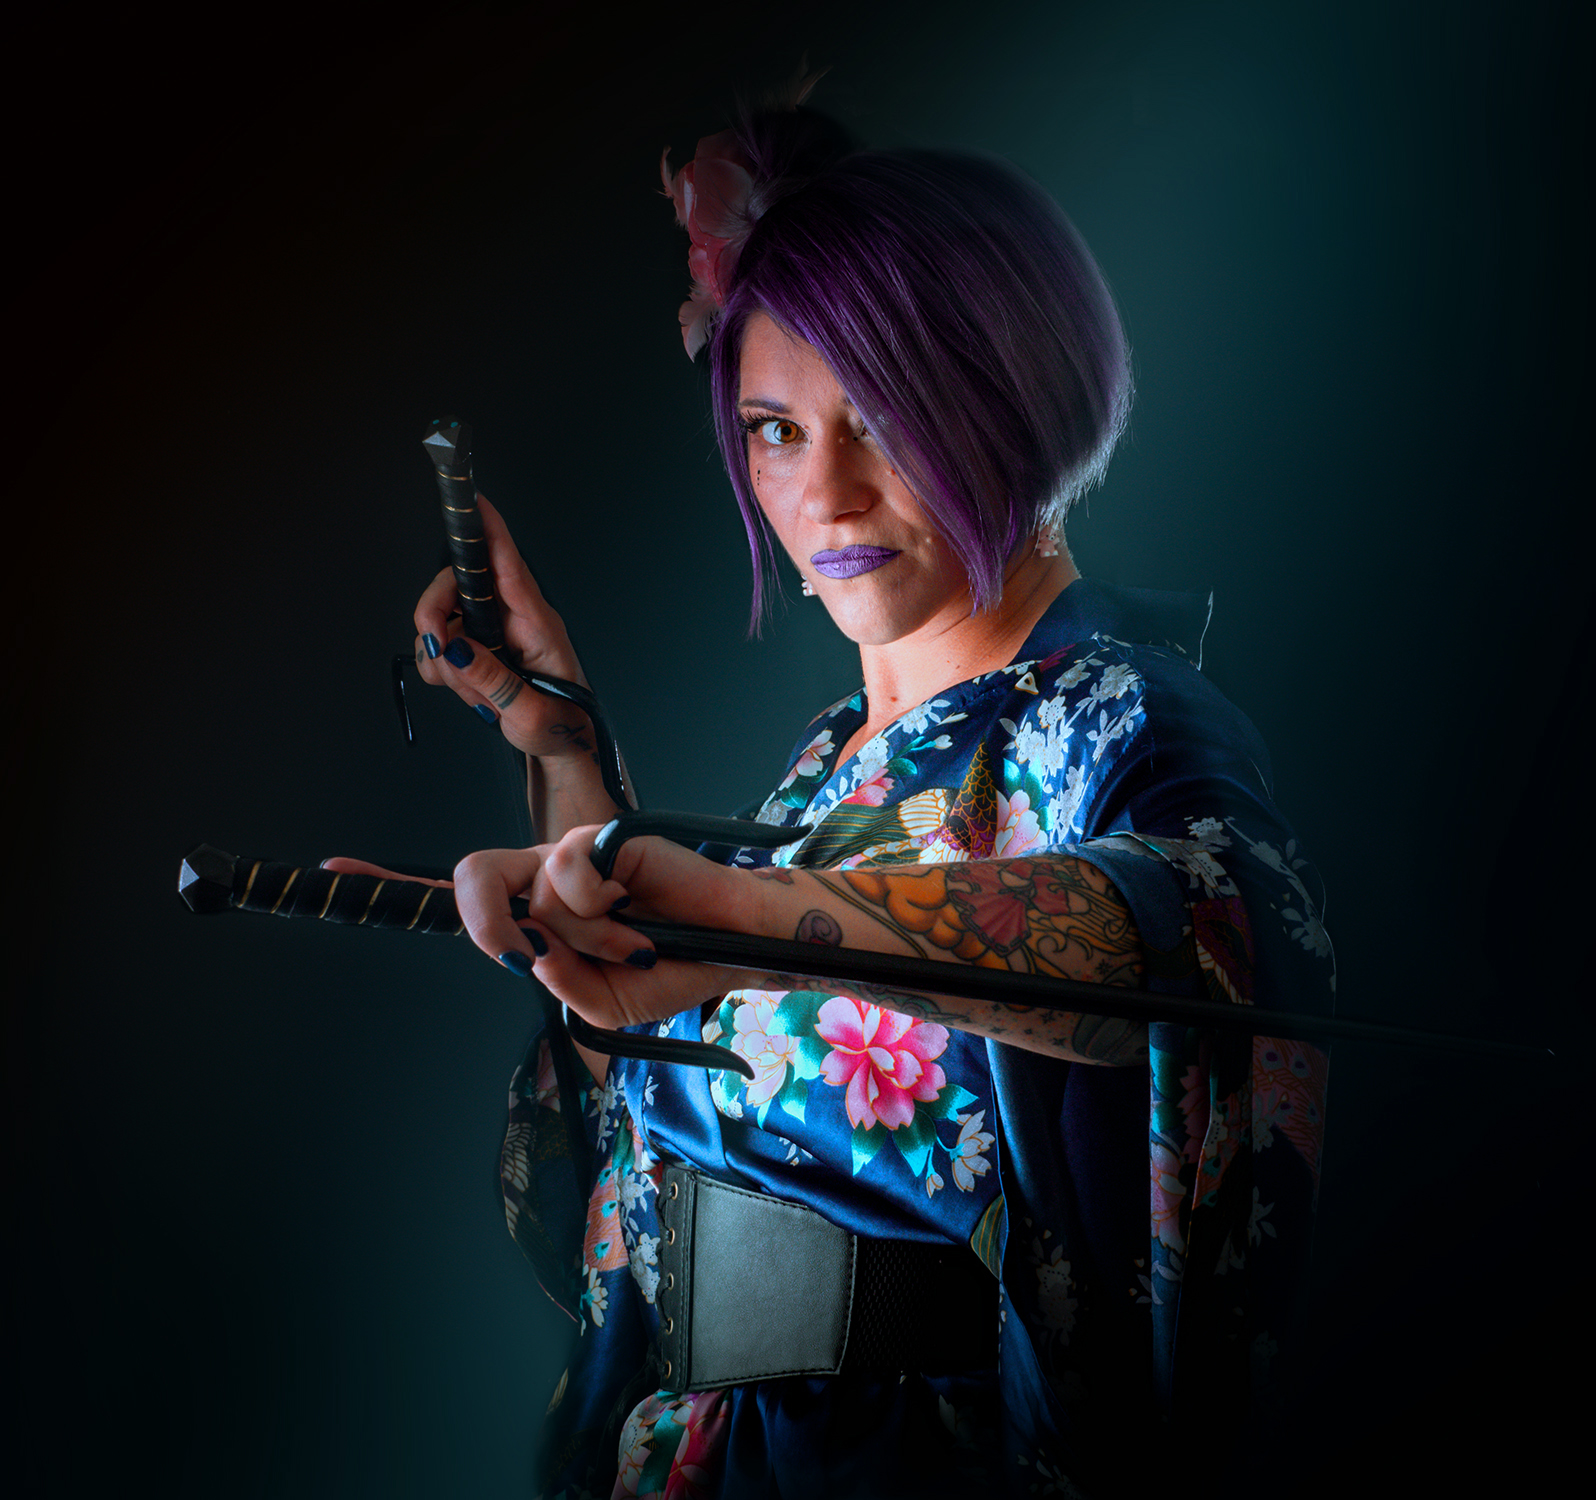 Sensivia photographe portraitiste Projet artistique